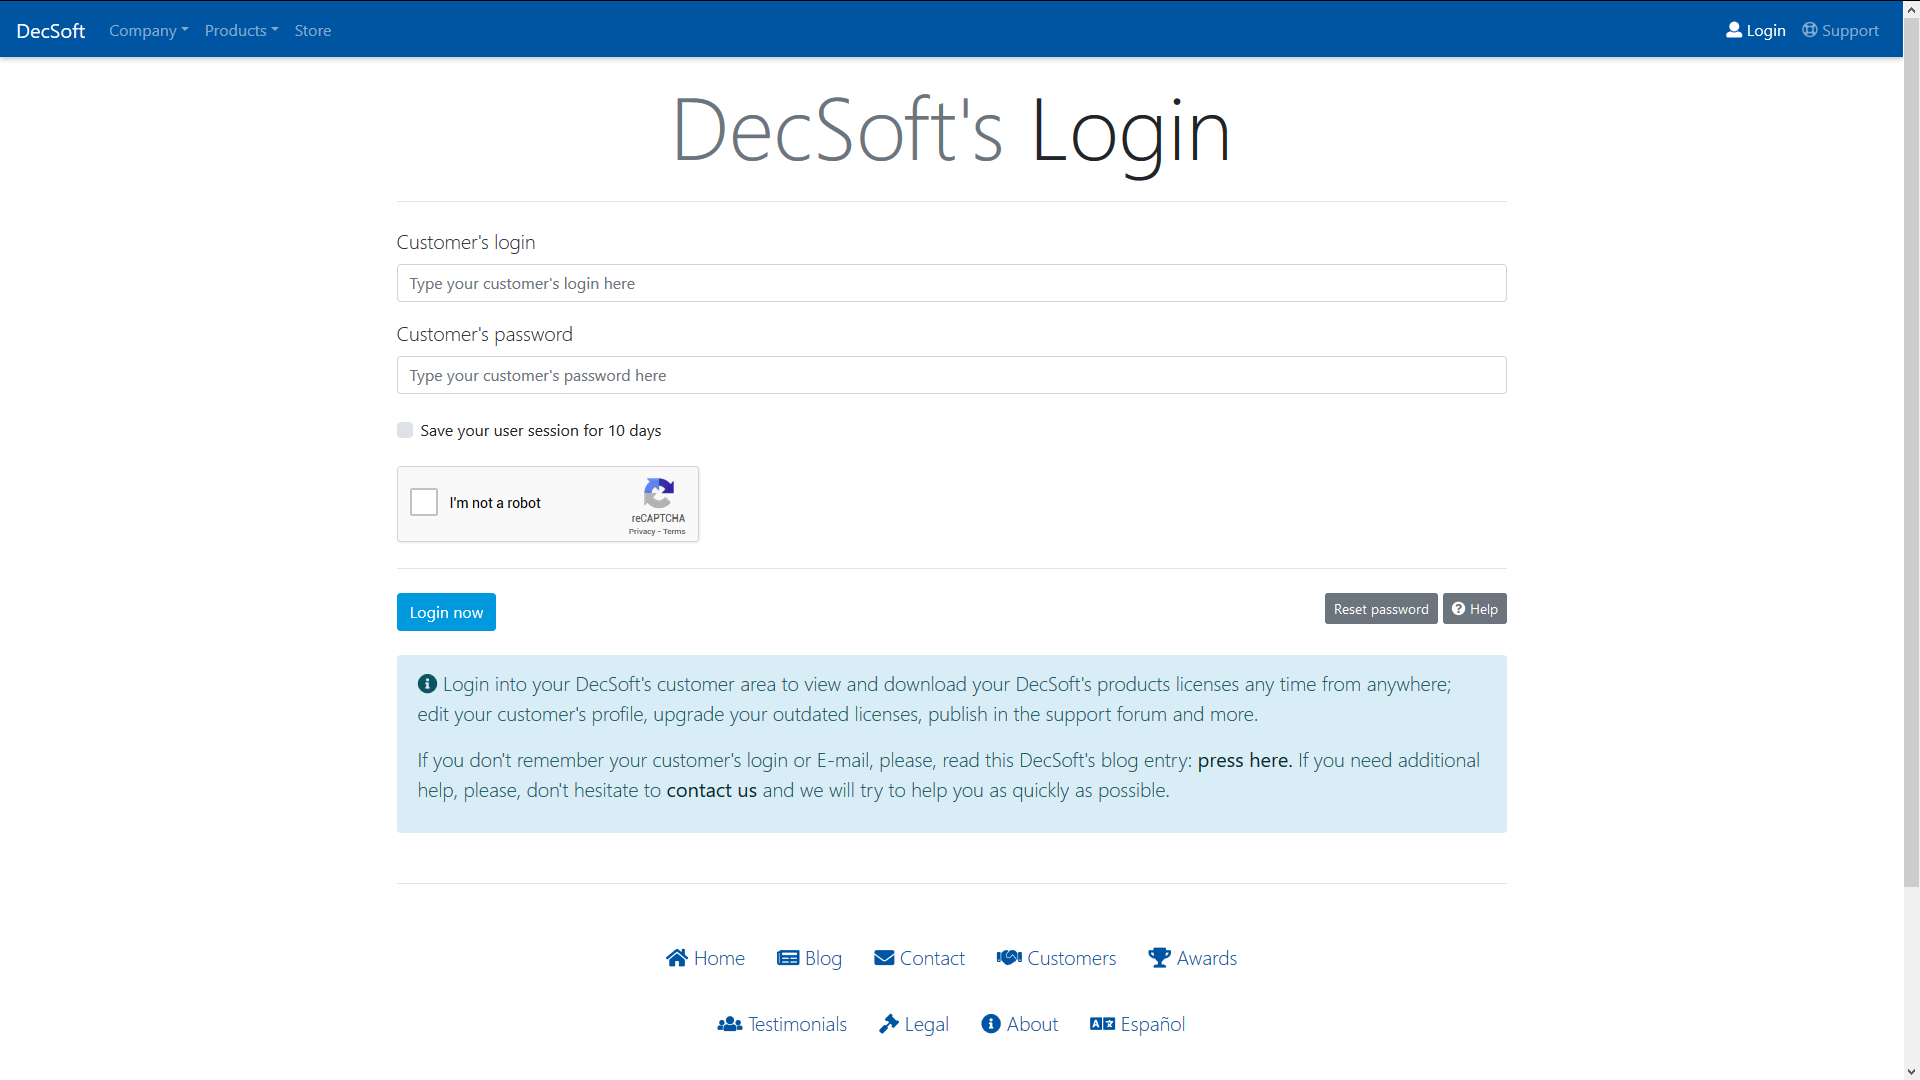 The DecSoft's reset customer's password form